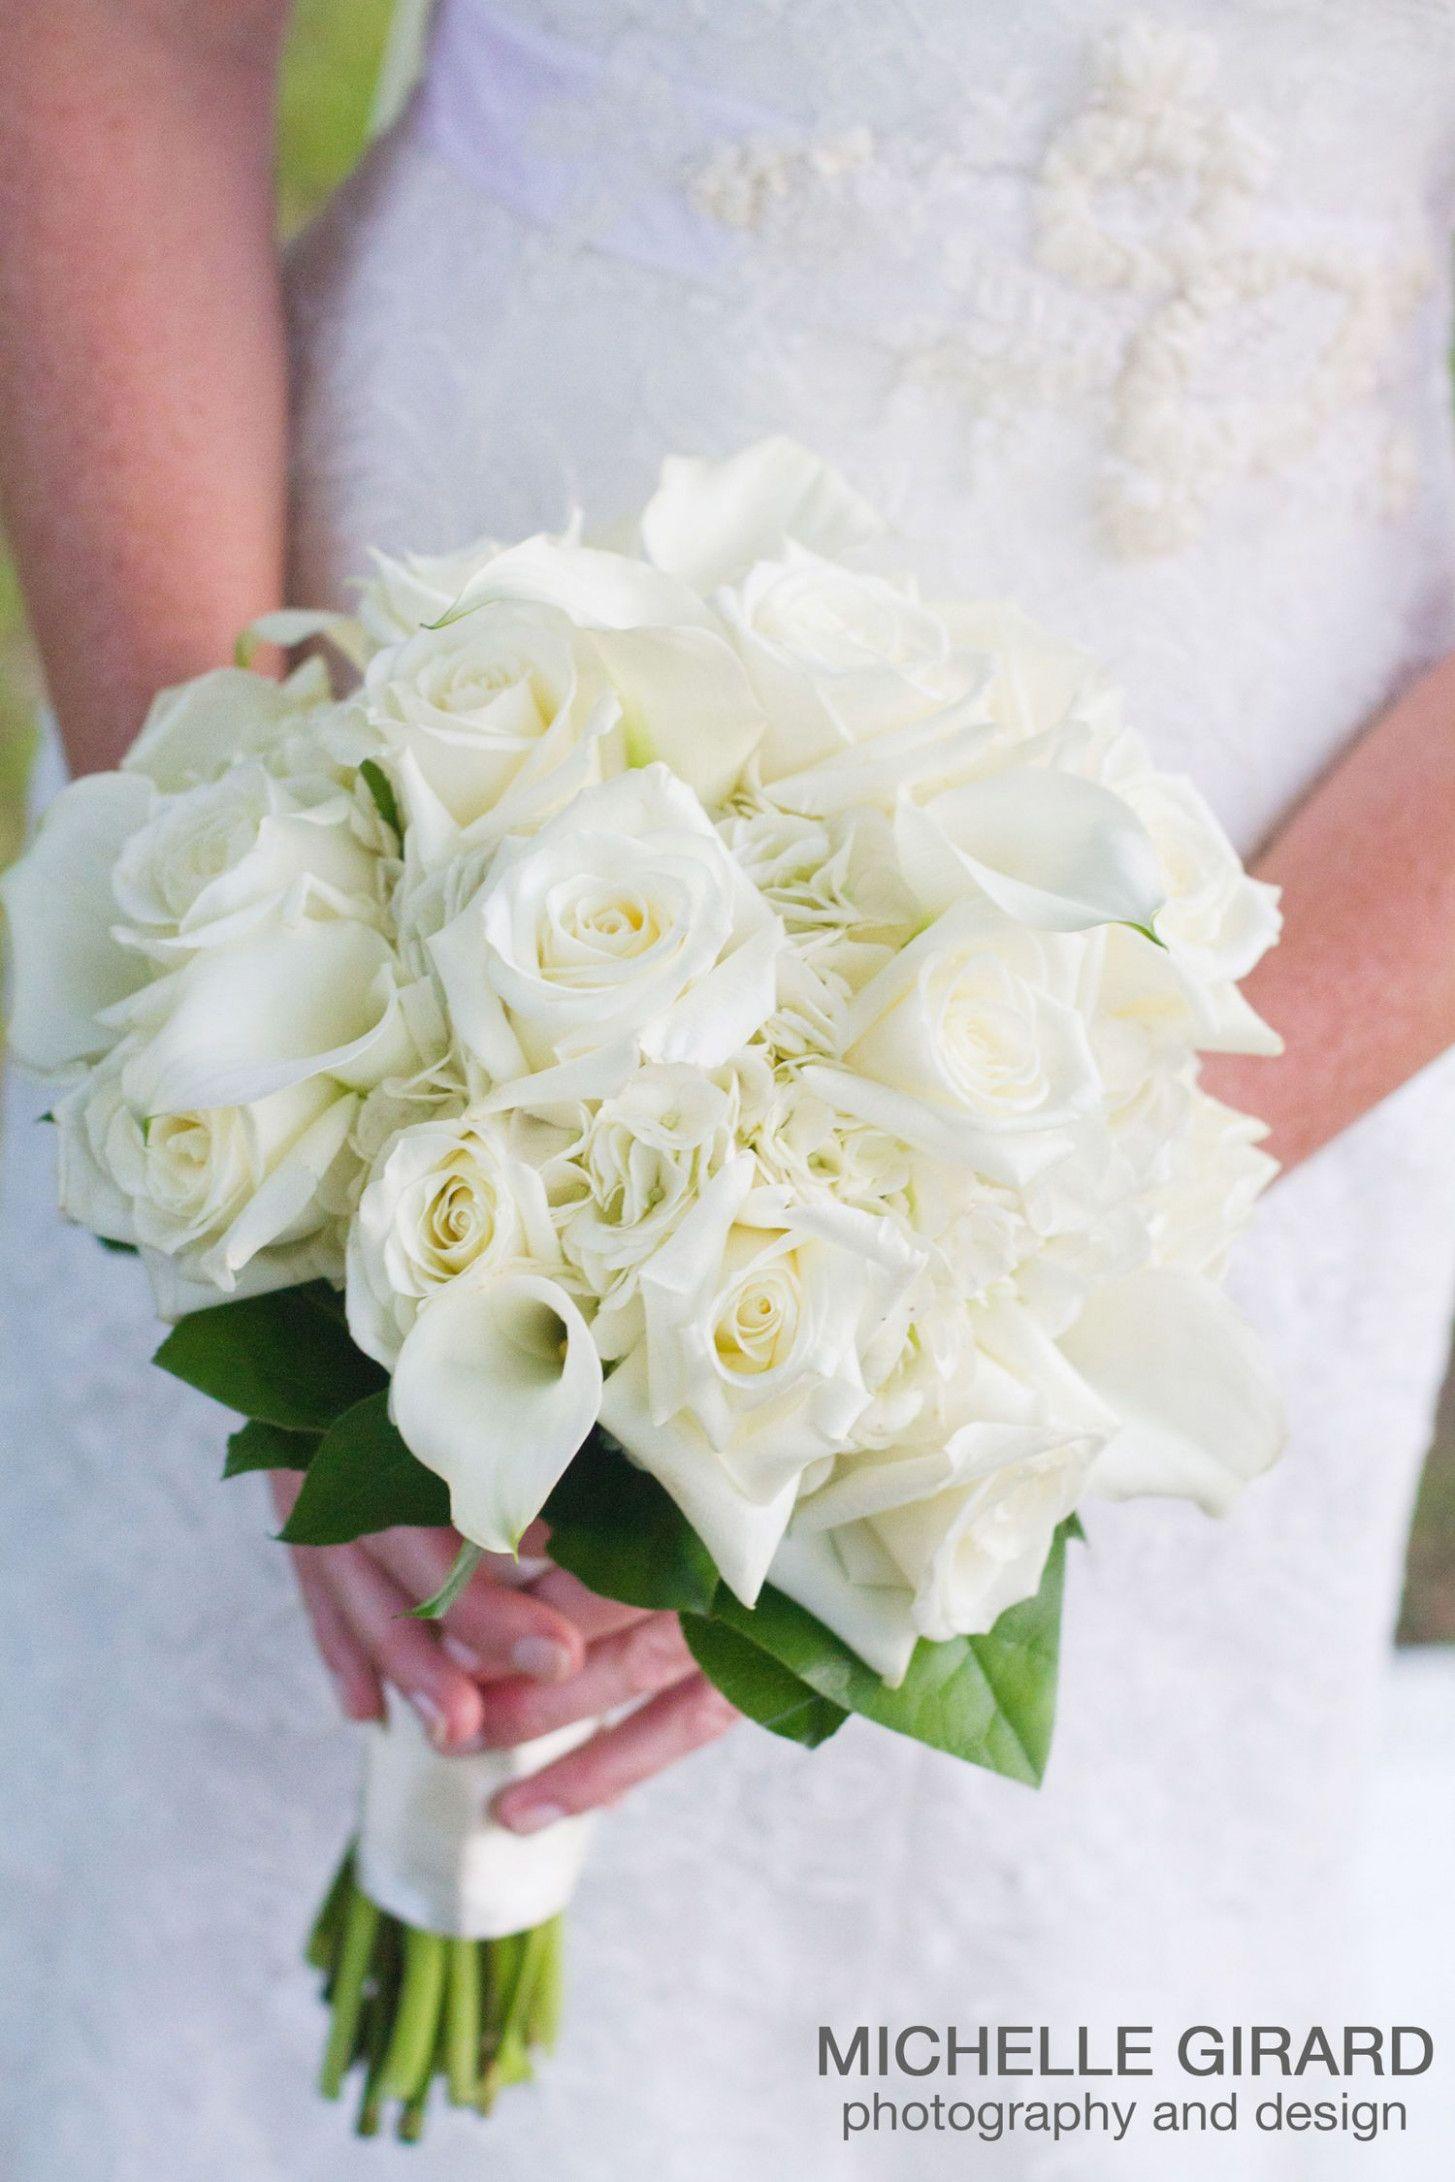 Wedding Hand Tied Bouquet Of White Roses White Hydrangea White Mini Calla Lilies Weddings Beach Flower Bouquet Wedding Calla Lily Bouquet Wedding Lily Wedding